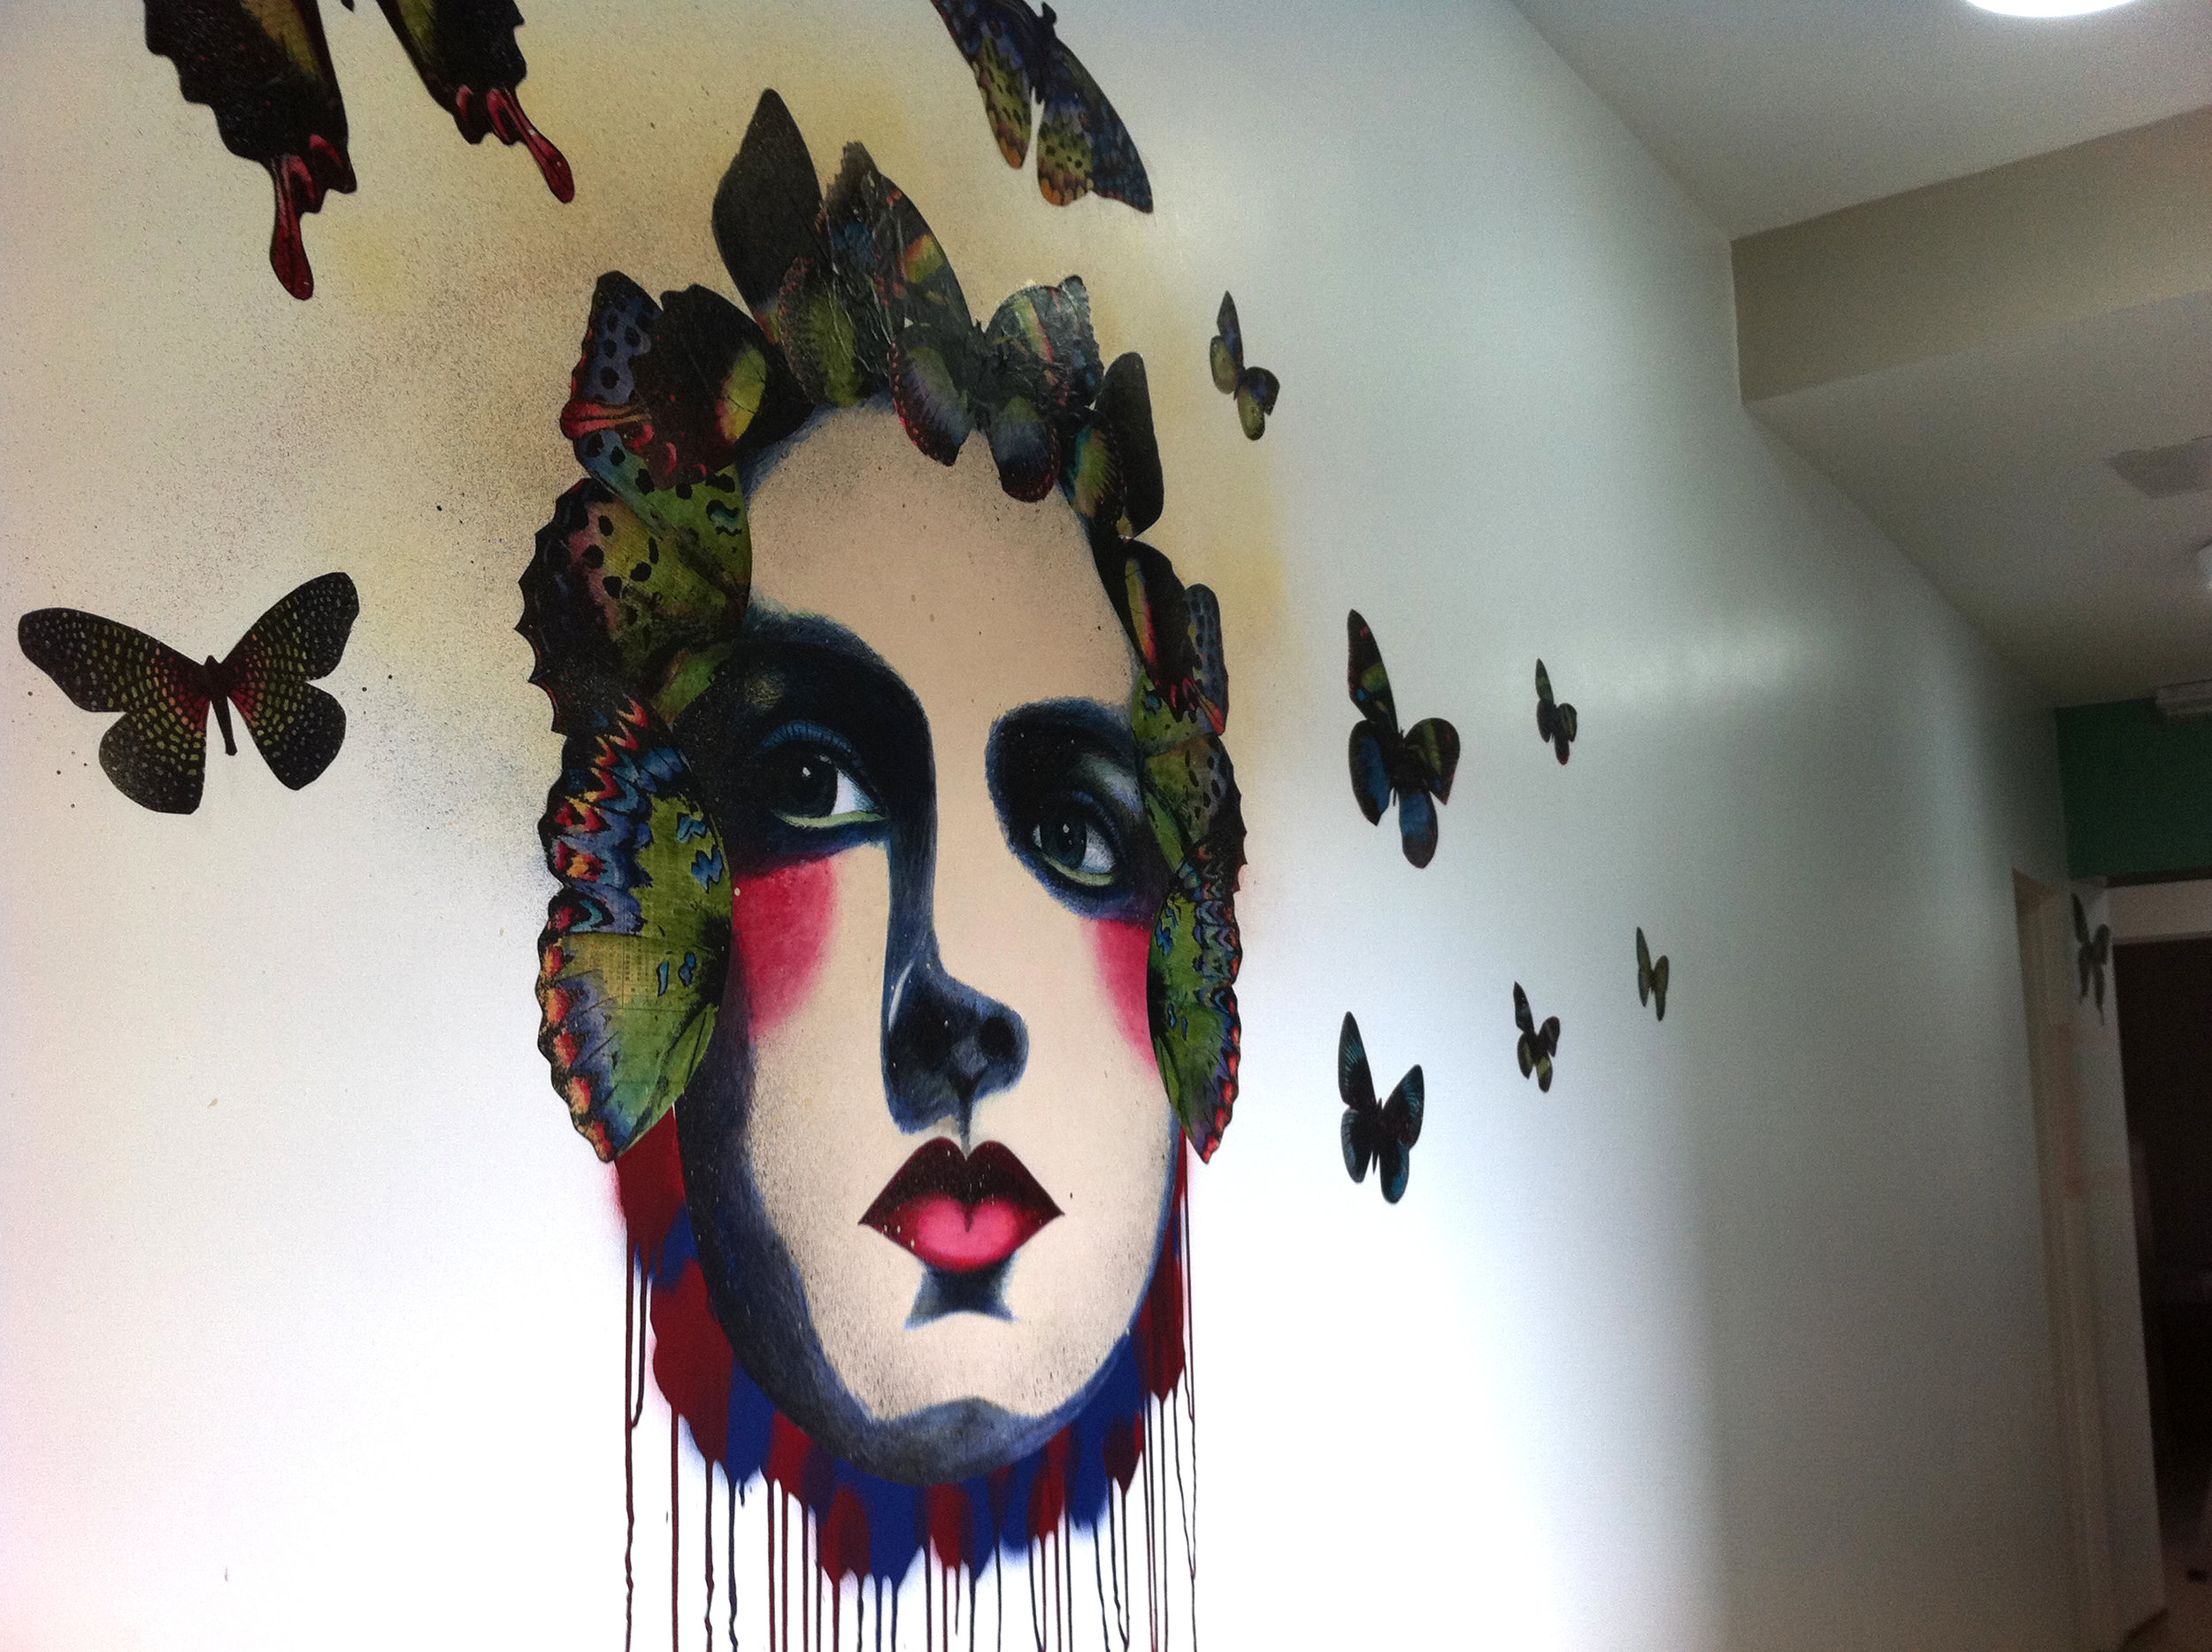 portrai3_butterflies.jpg